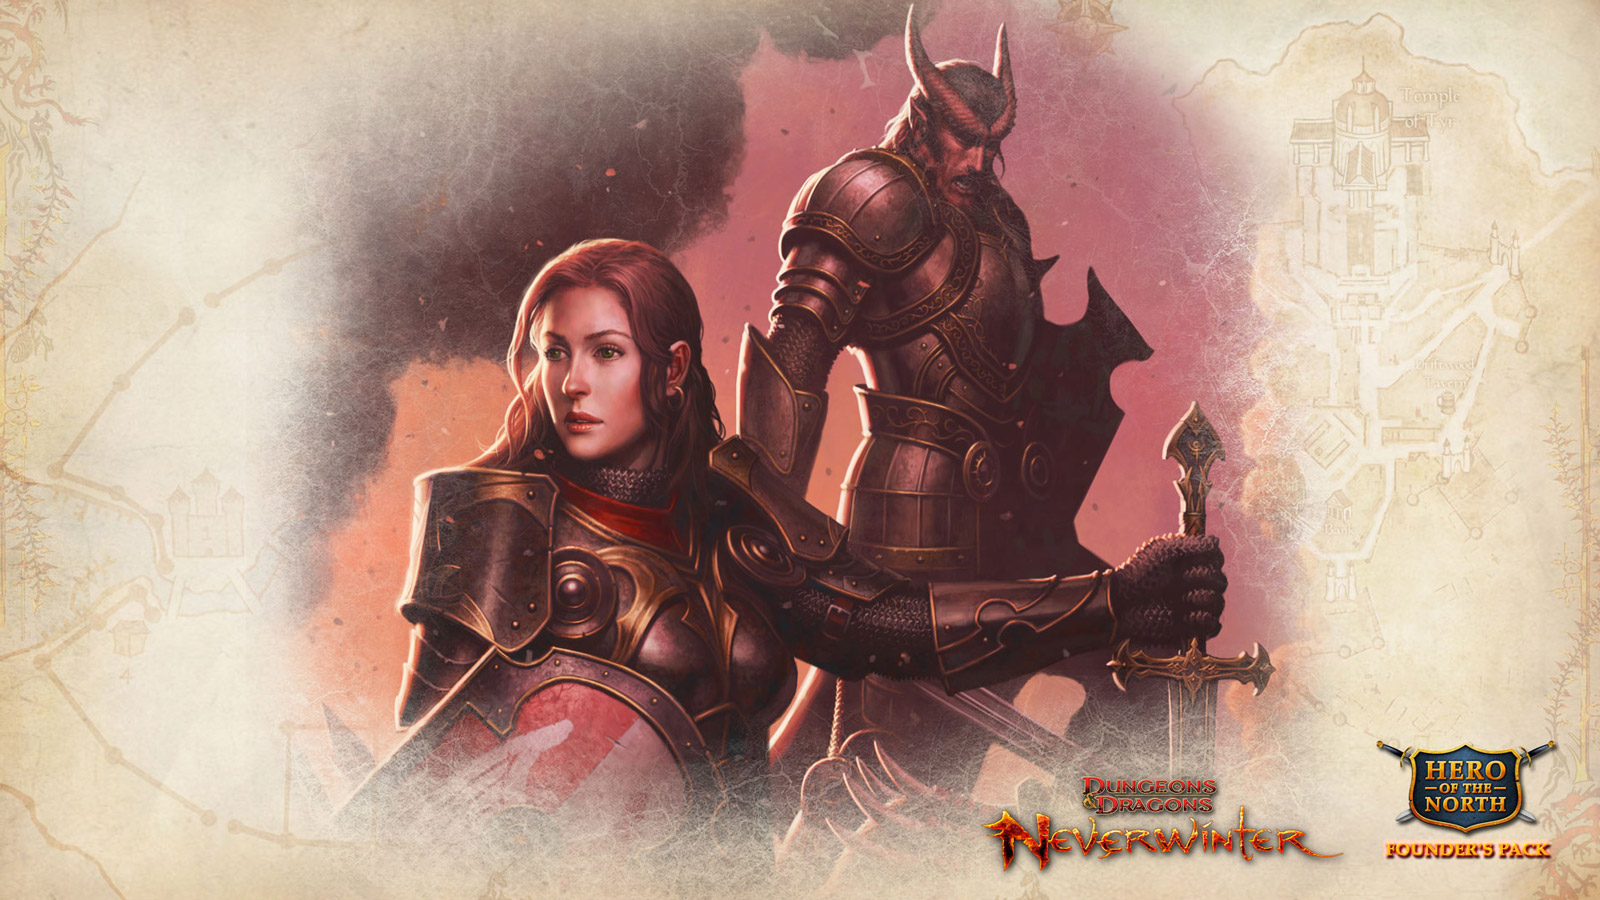 Free Neverwinter Wallpaper in 1600x900